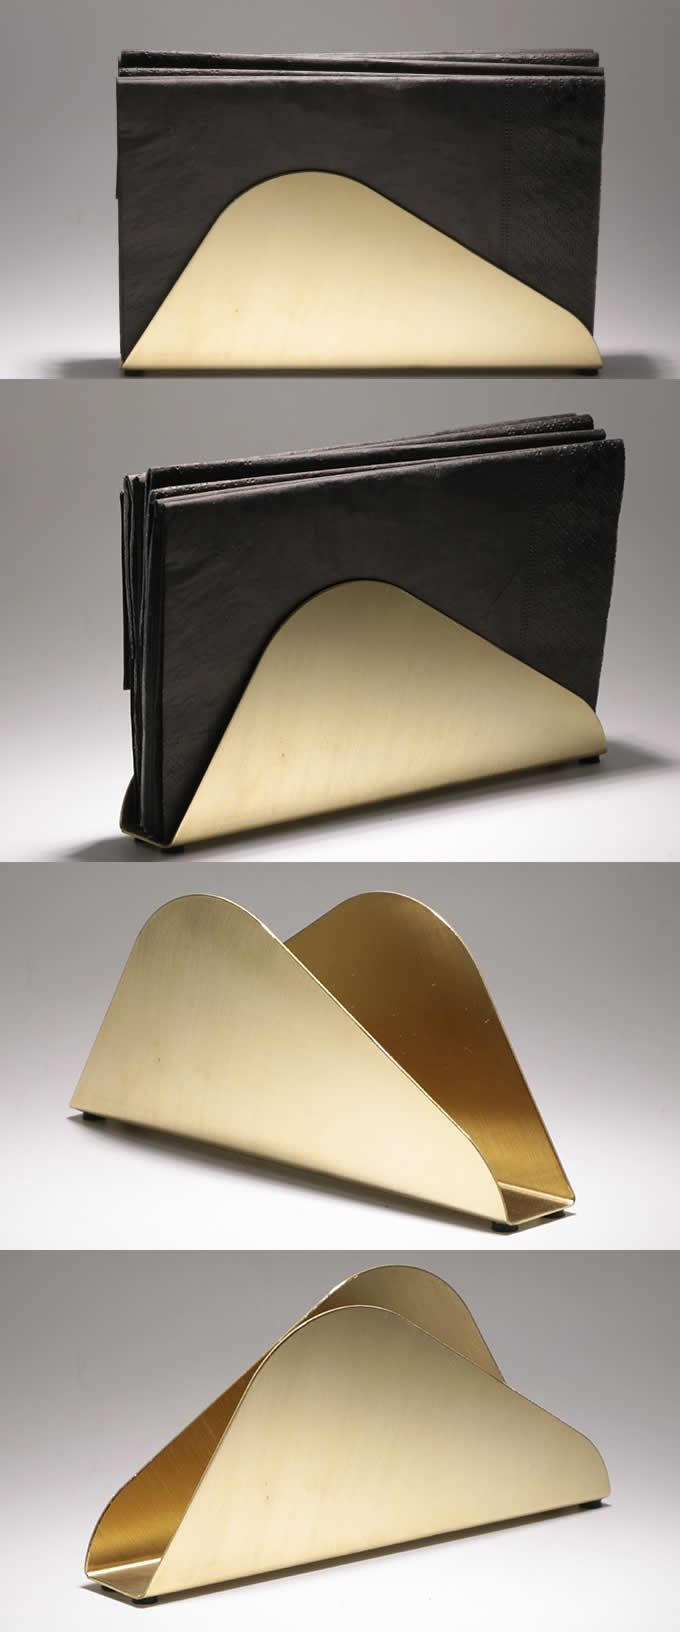 Brass Modern Tissue Box Paper Holder Napkin Holder Stand Rack Vertical Box Caddy Napkin Holder Modern Napkin Holders Tissue Napkins